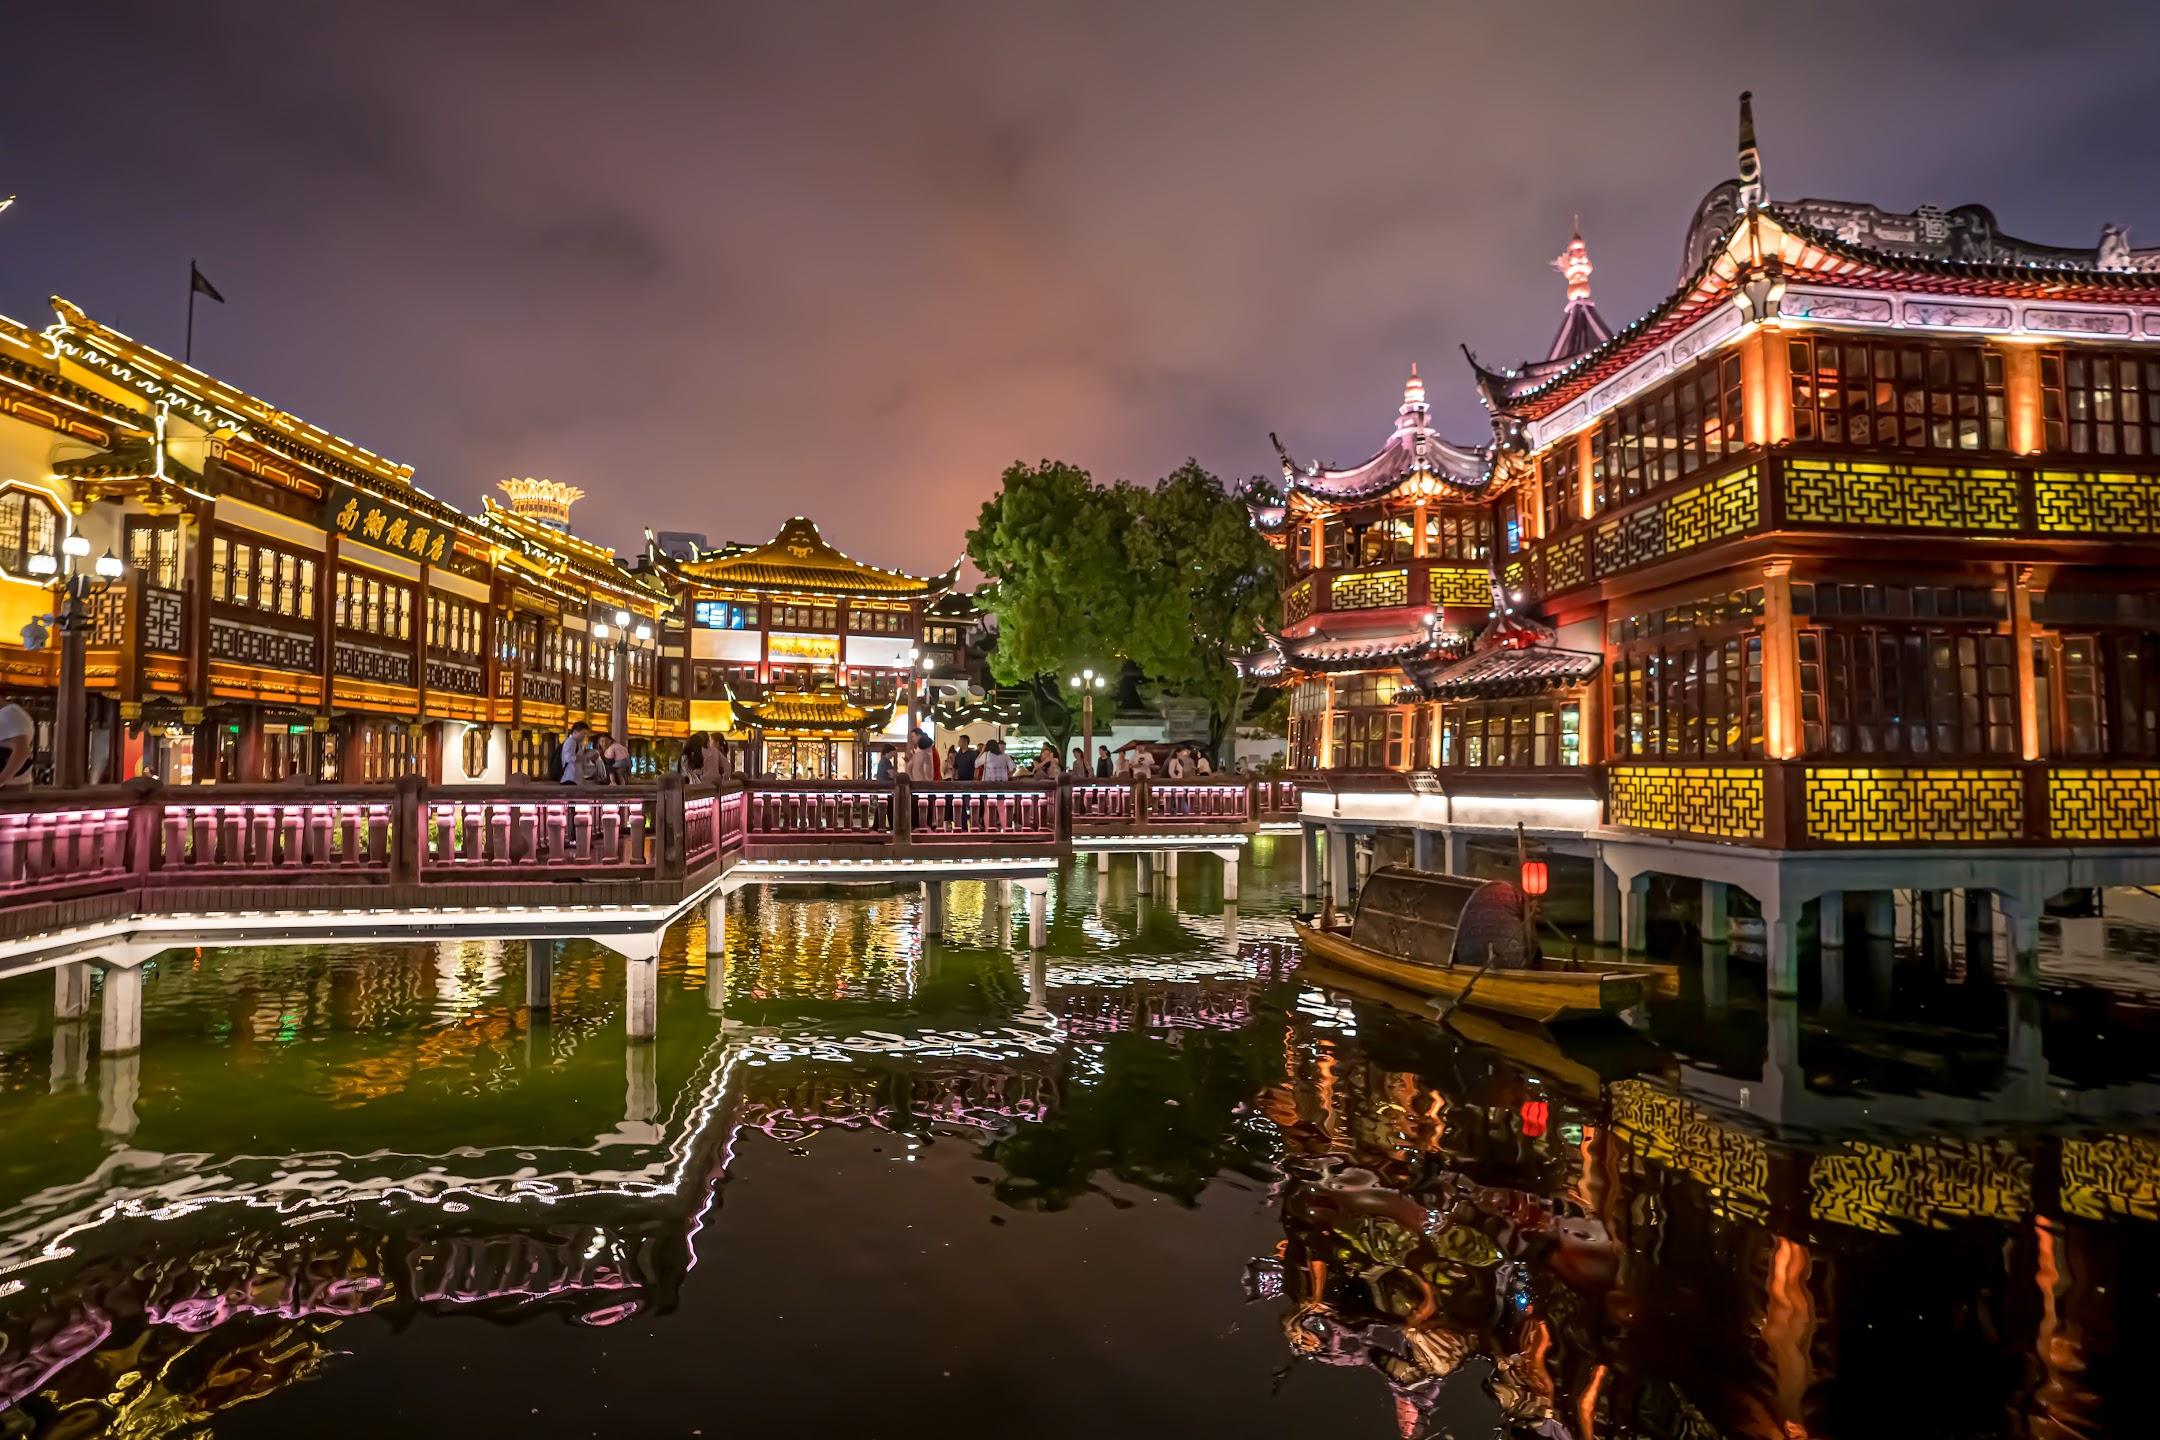 Shanghai Yuyuan Huxin Pavilion (The Mid-Lake Pavilion Teahouse) Light-up2